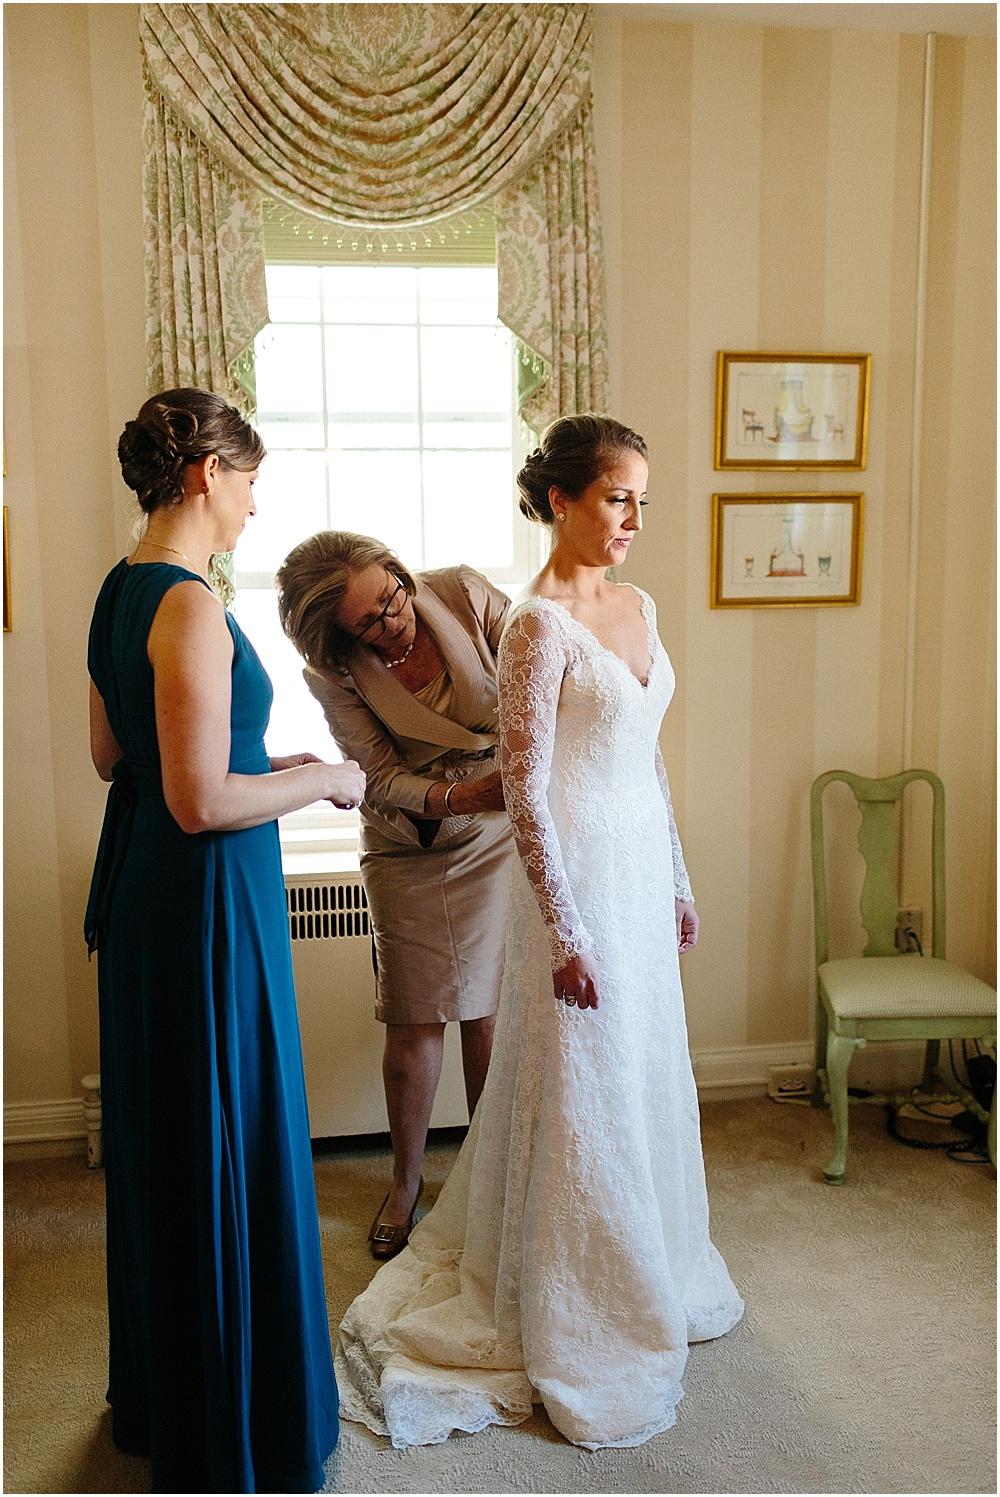 Vane_Baltimore_Country_Club_Wedding_Baltimore_Wedding_Photographer_0019